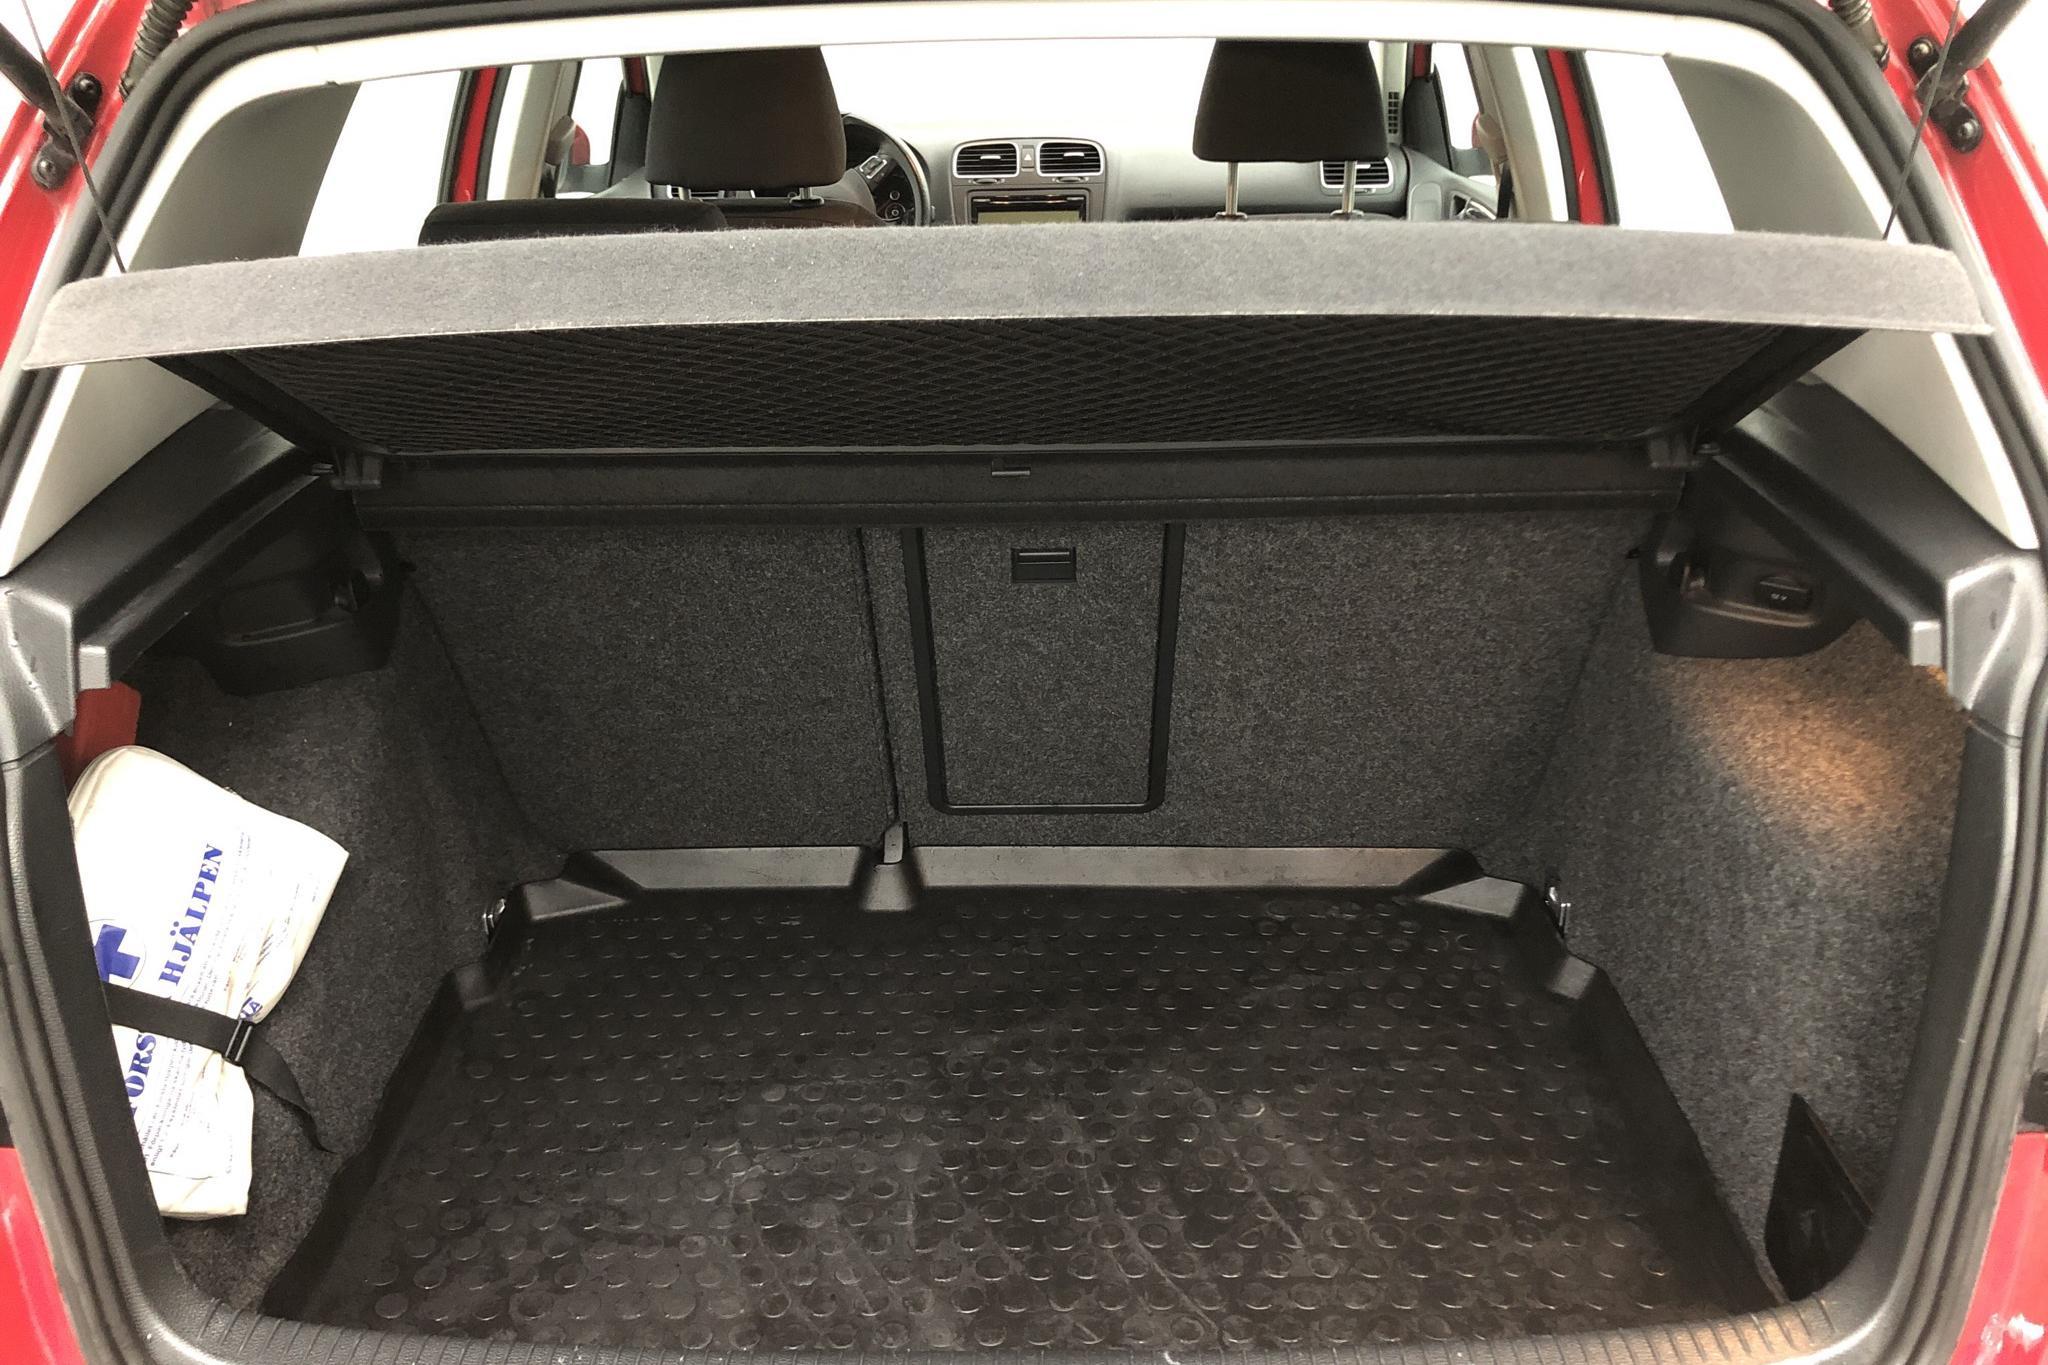 VW Golf VI 1.4 TSI 5dr (122hk) - 6 500 mil - Manuell - röd - 2009